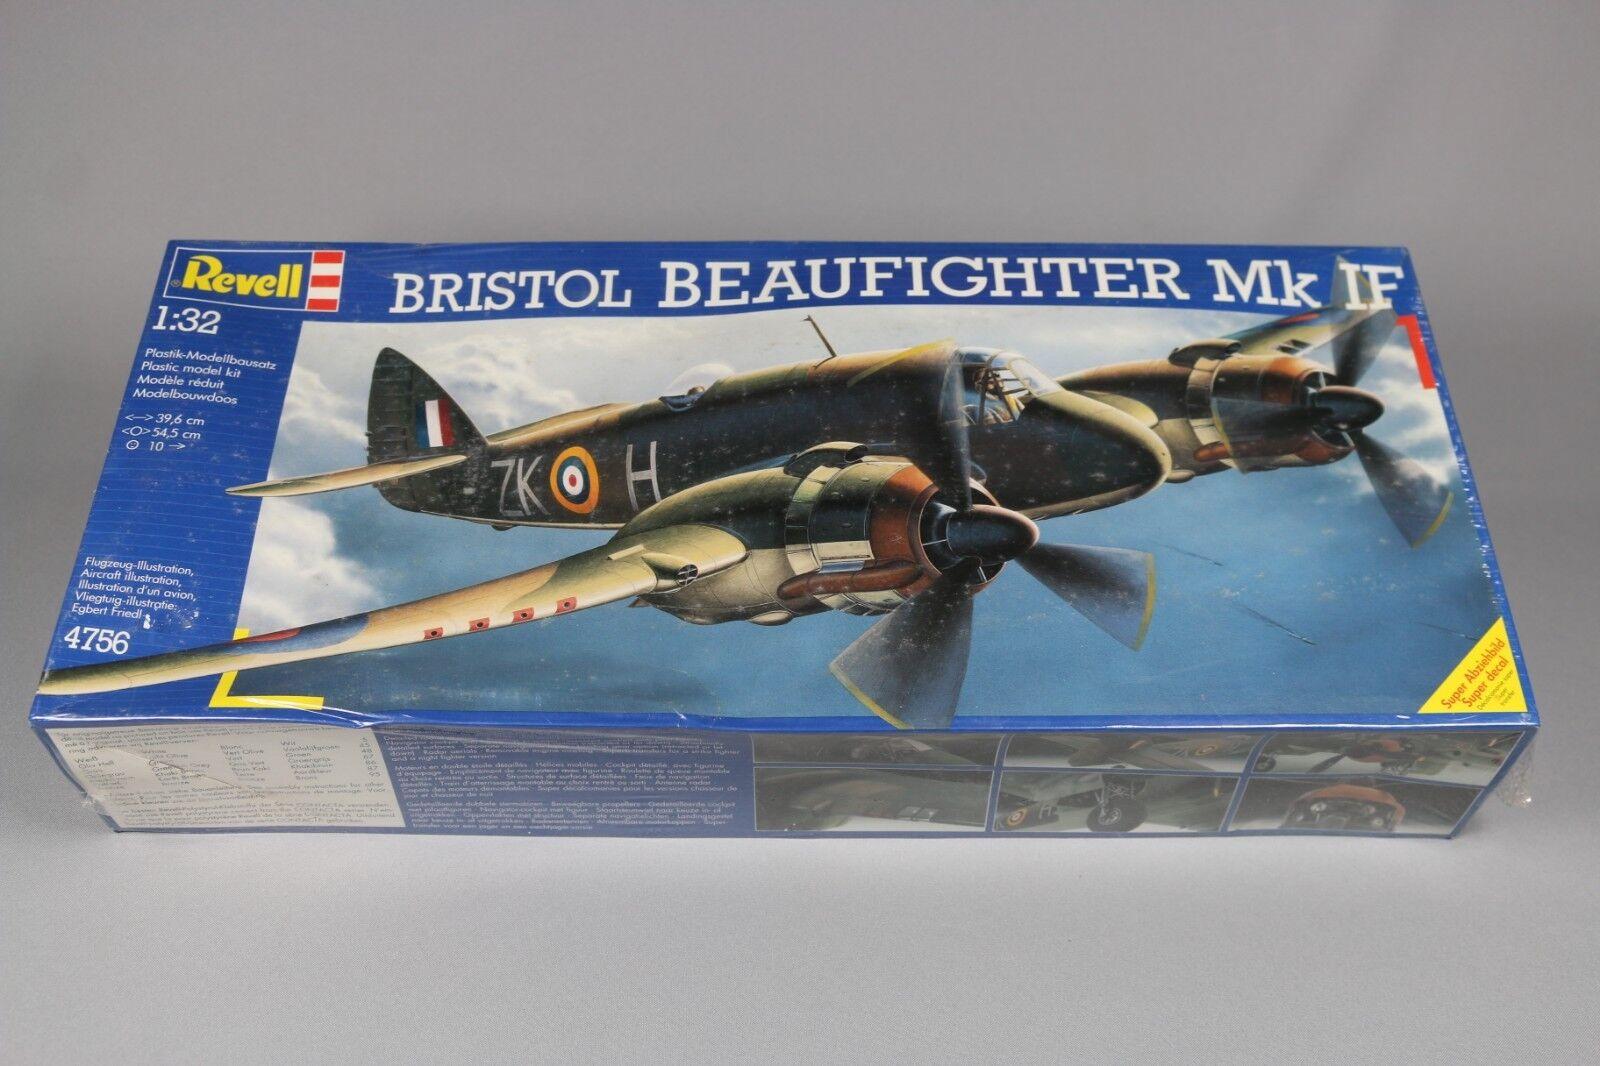 ZF013 Revell 1 32 maquette avion 4756 Bristol Beaufighter Mk IF 54,5 cm env